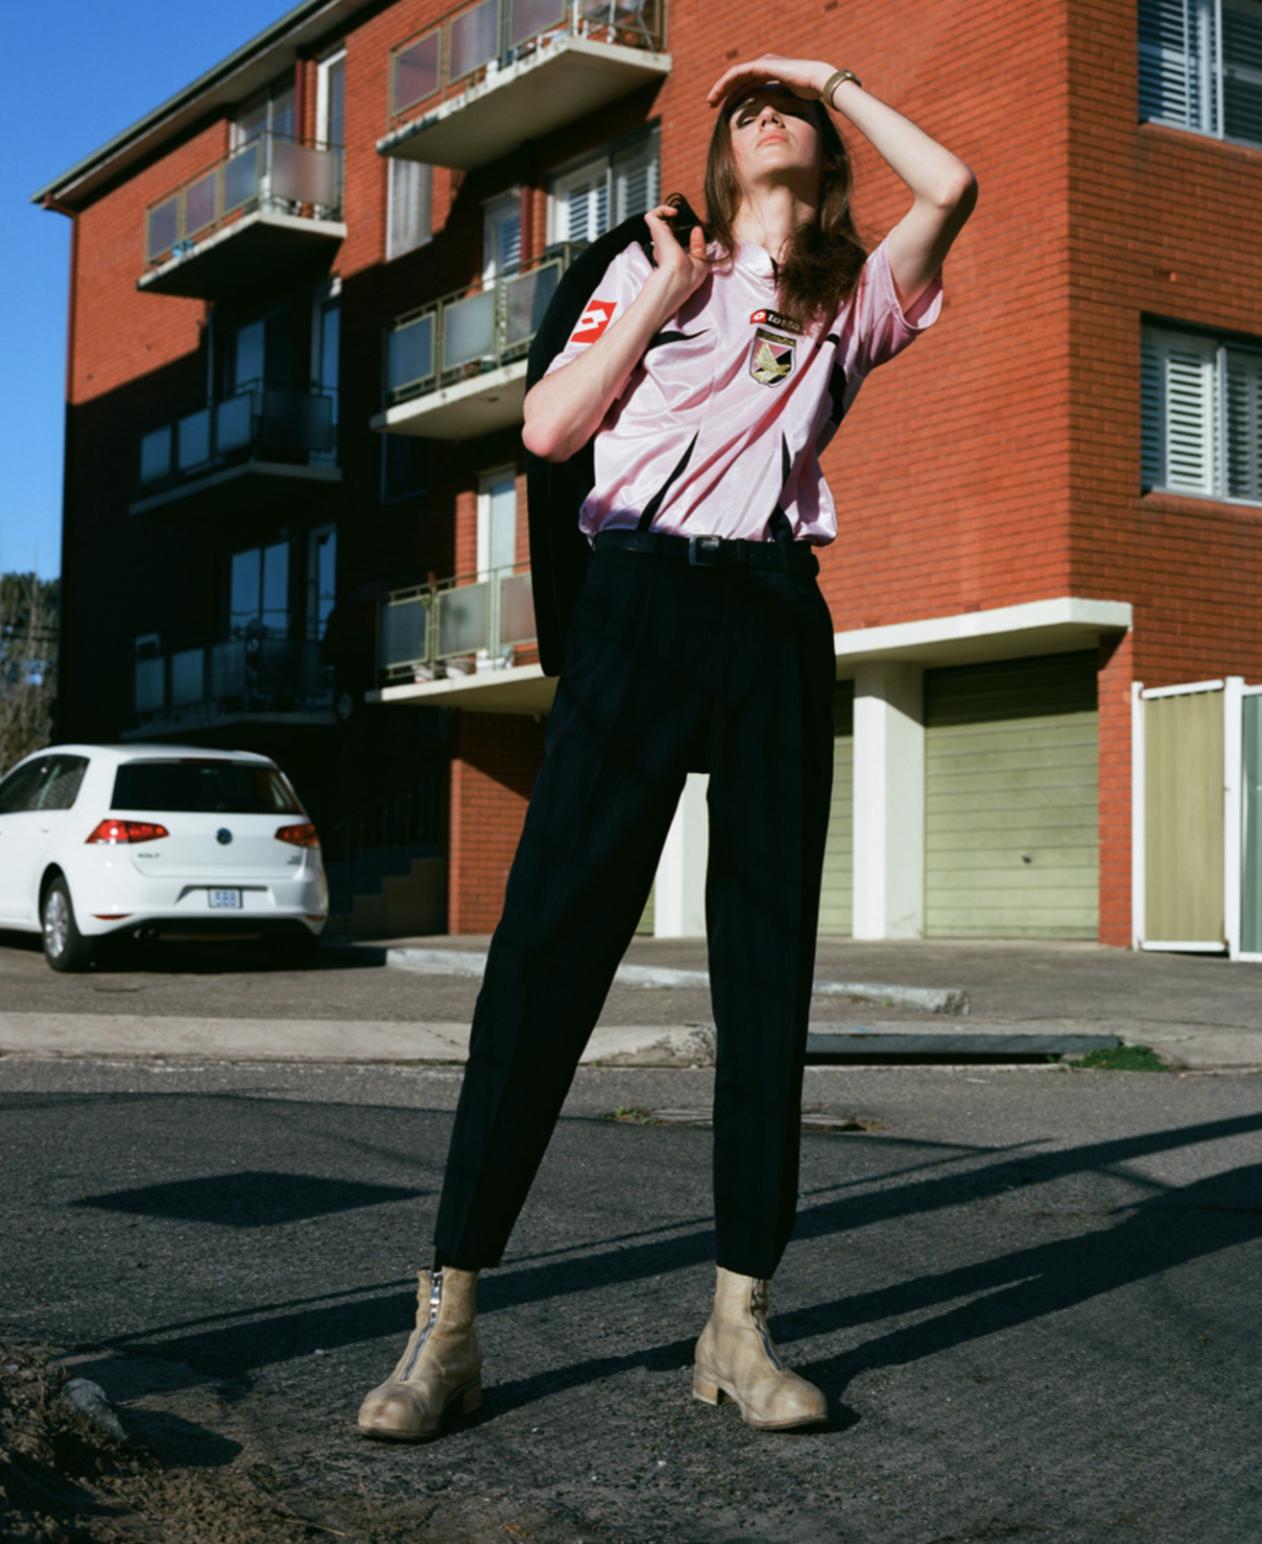 HARRY - PHOTOGRAPHER: VLADIMIR KRAVCHENKO @vladimirnkravchenkoMODEL: HARRISON MCTAVISH  @harry.mp3 @debutmanagementeditorial complete in vintage wardrobe.